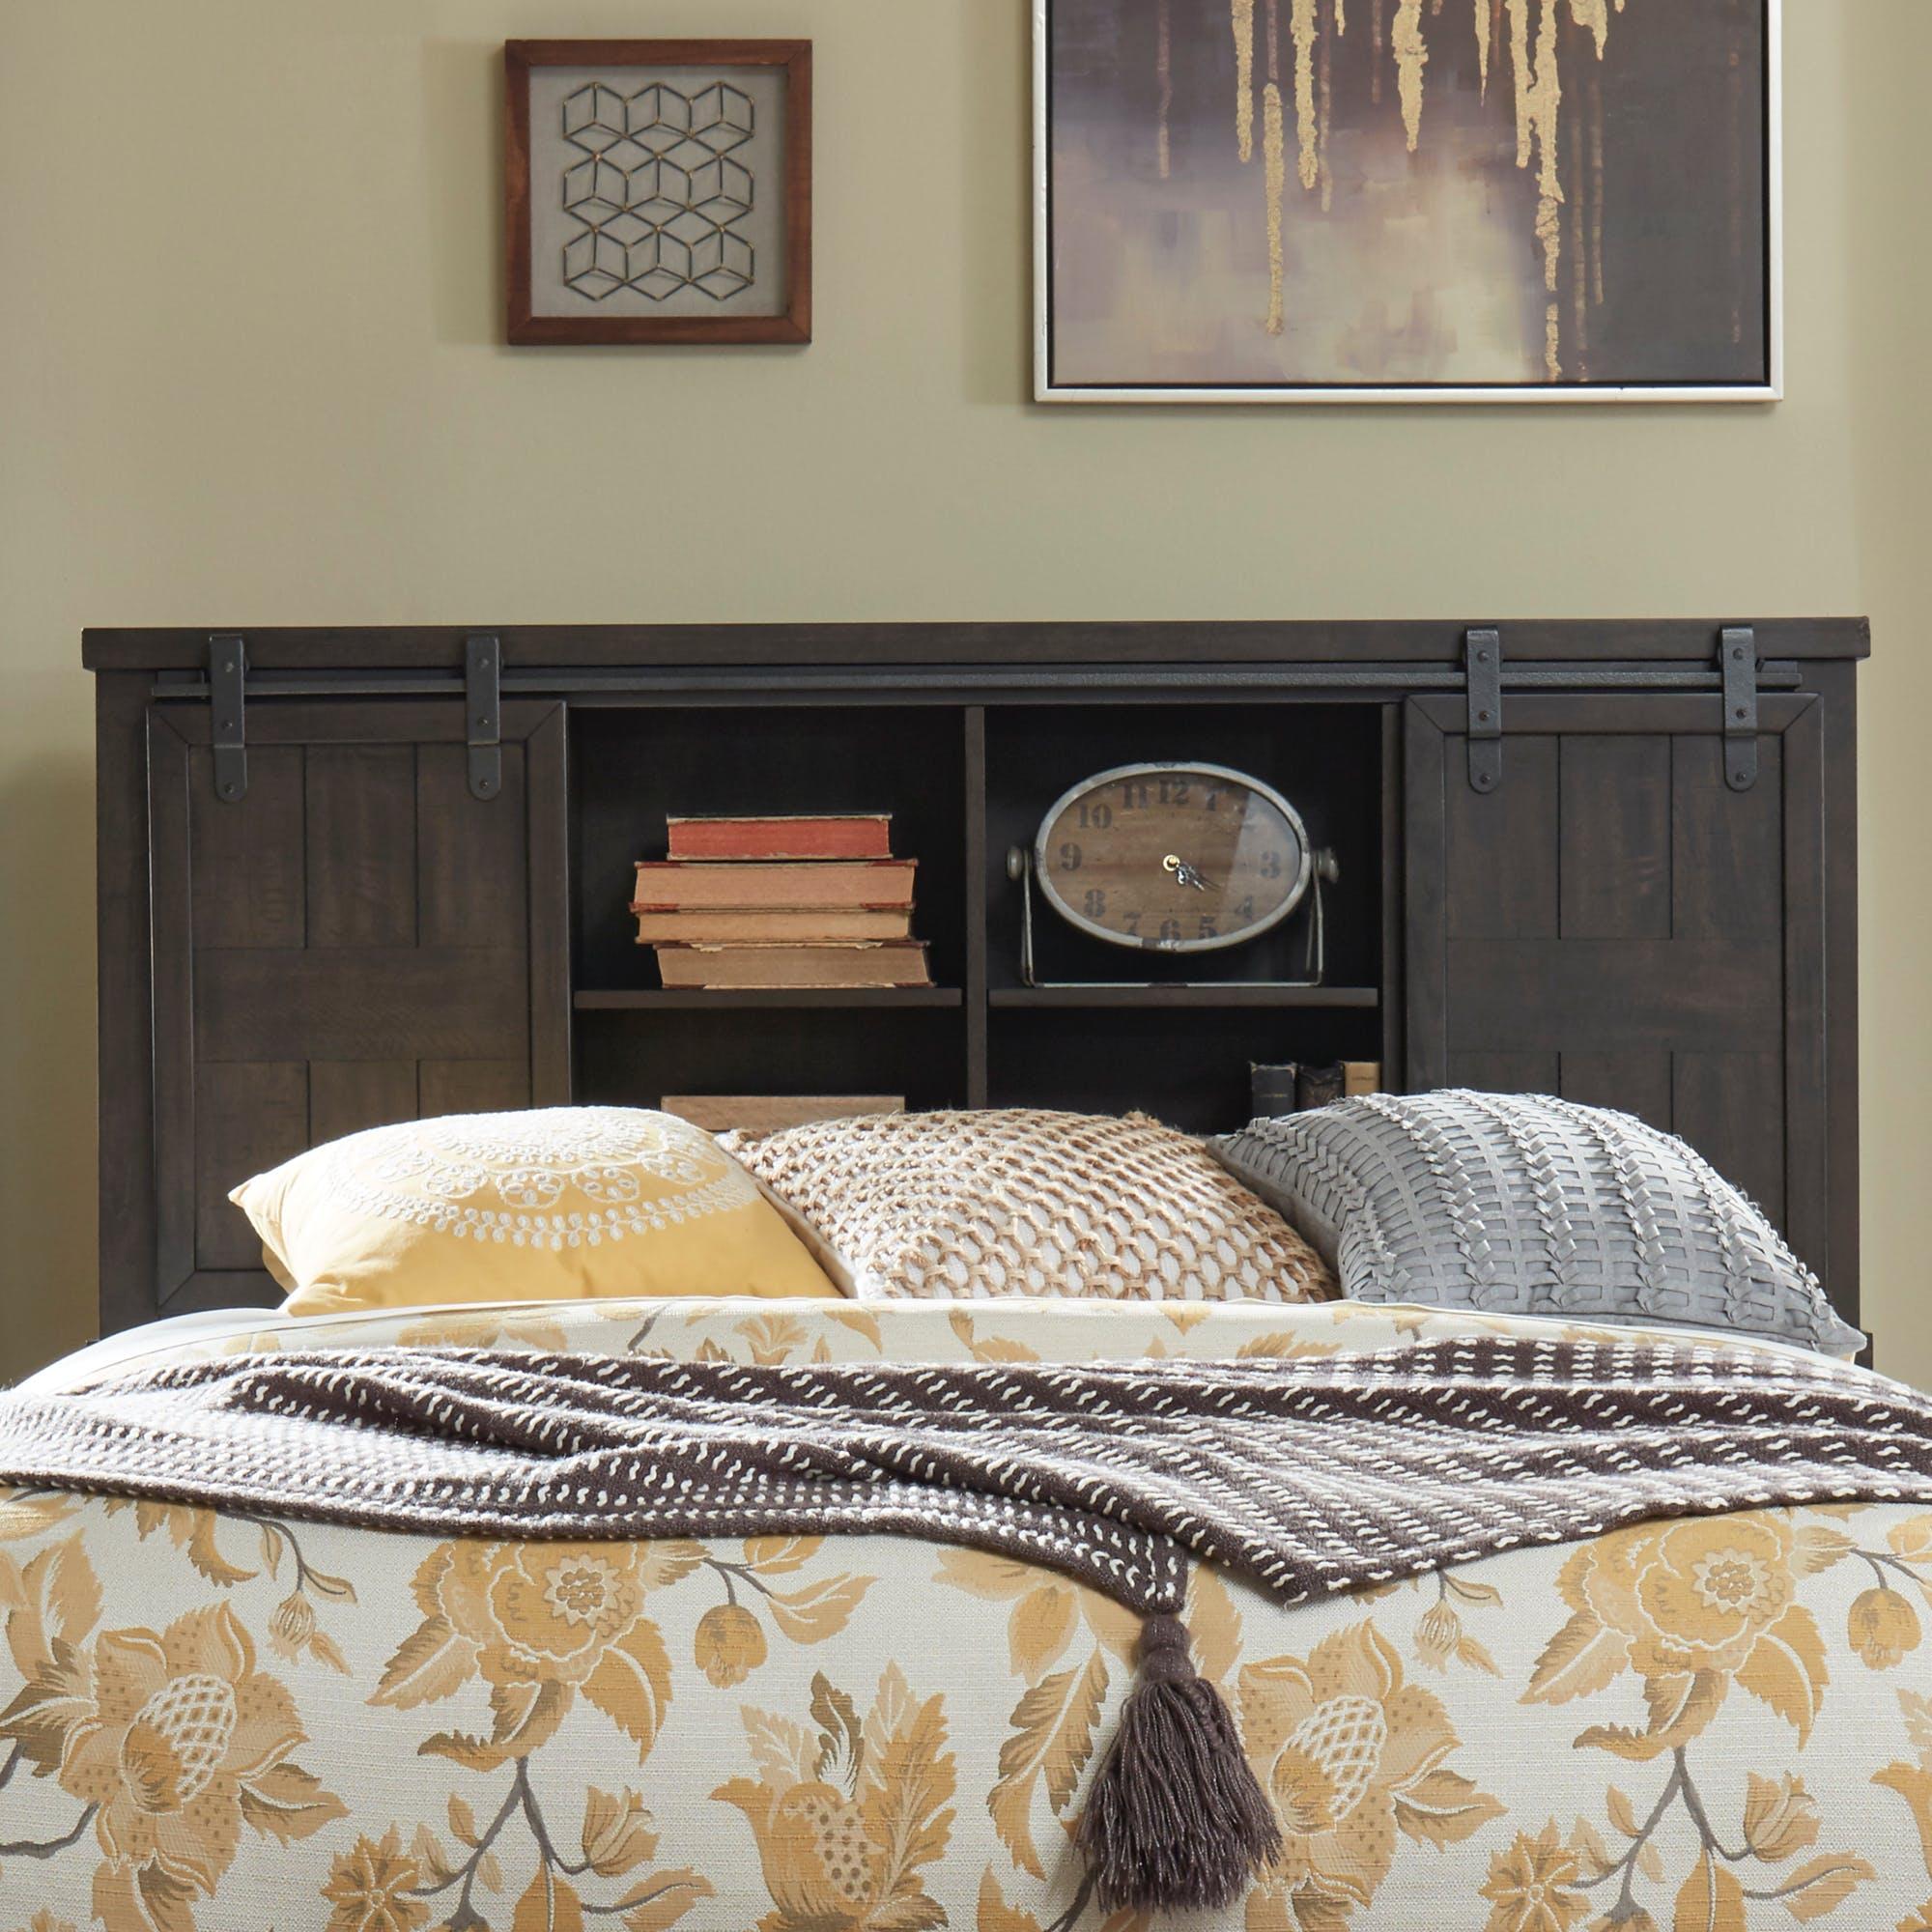 Liberty Furniture Bedroom King Bookcase Headboard 759 Br15b